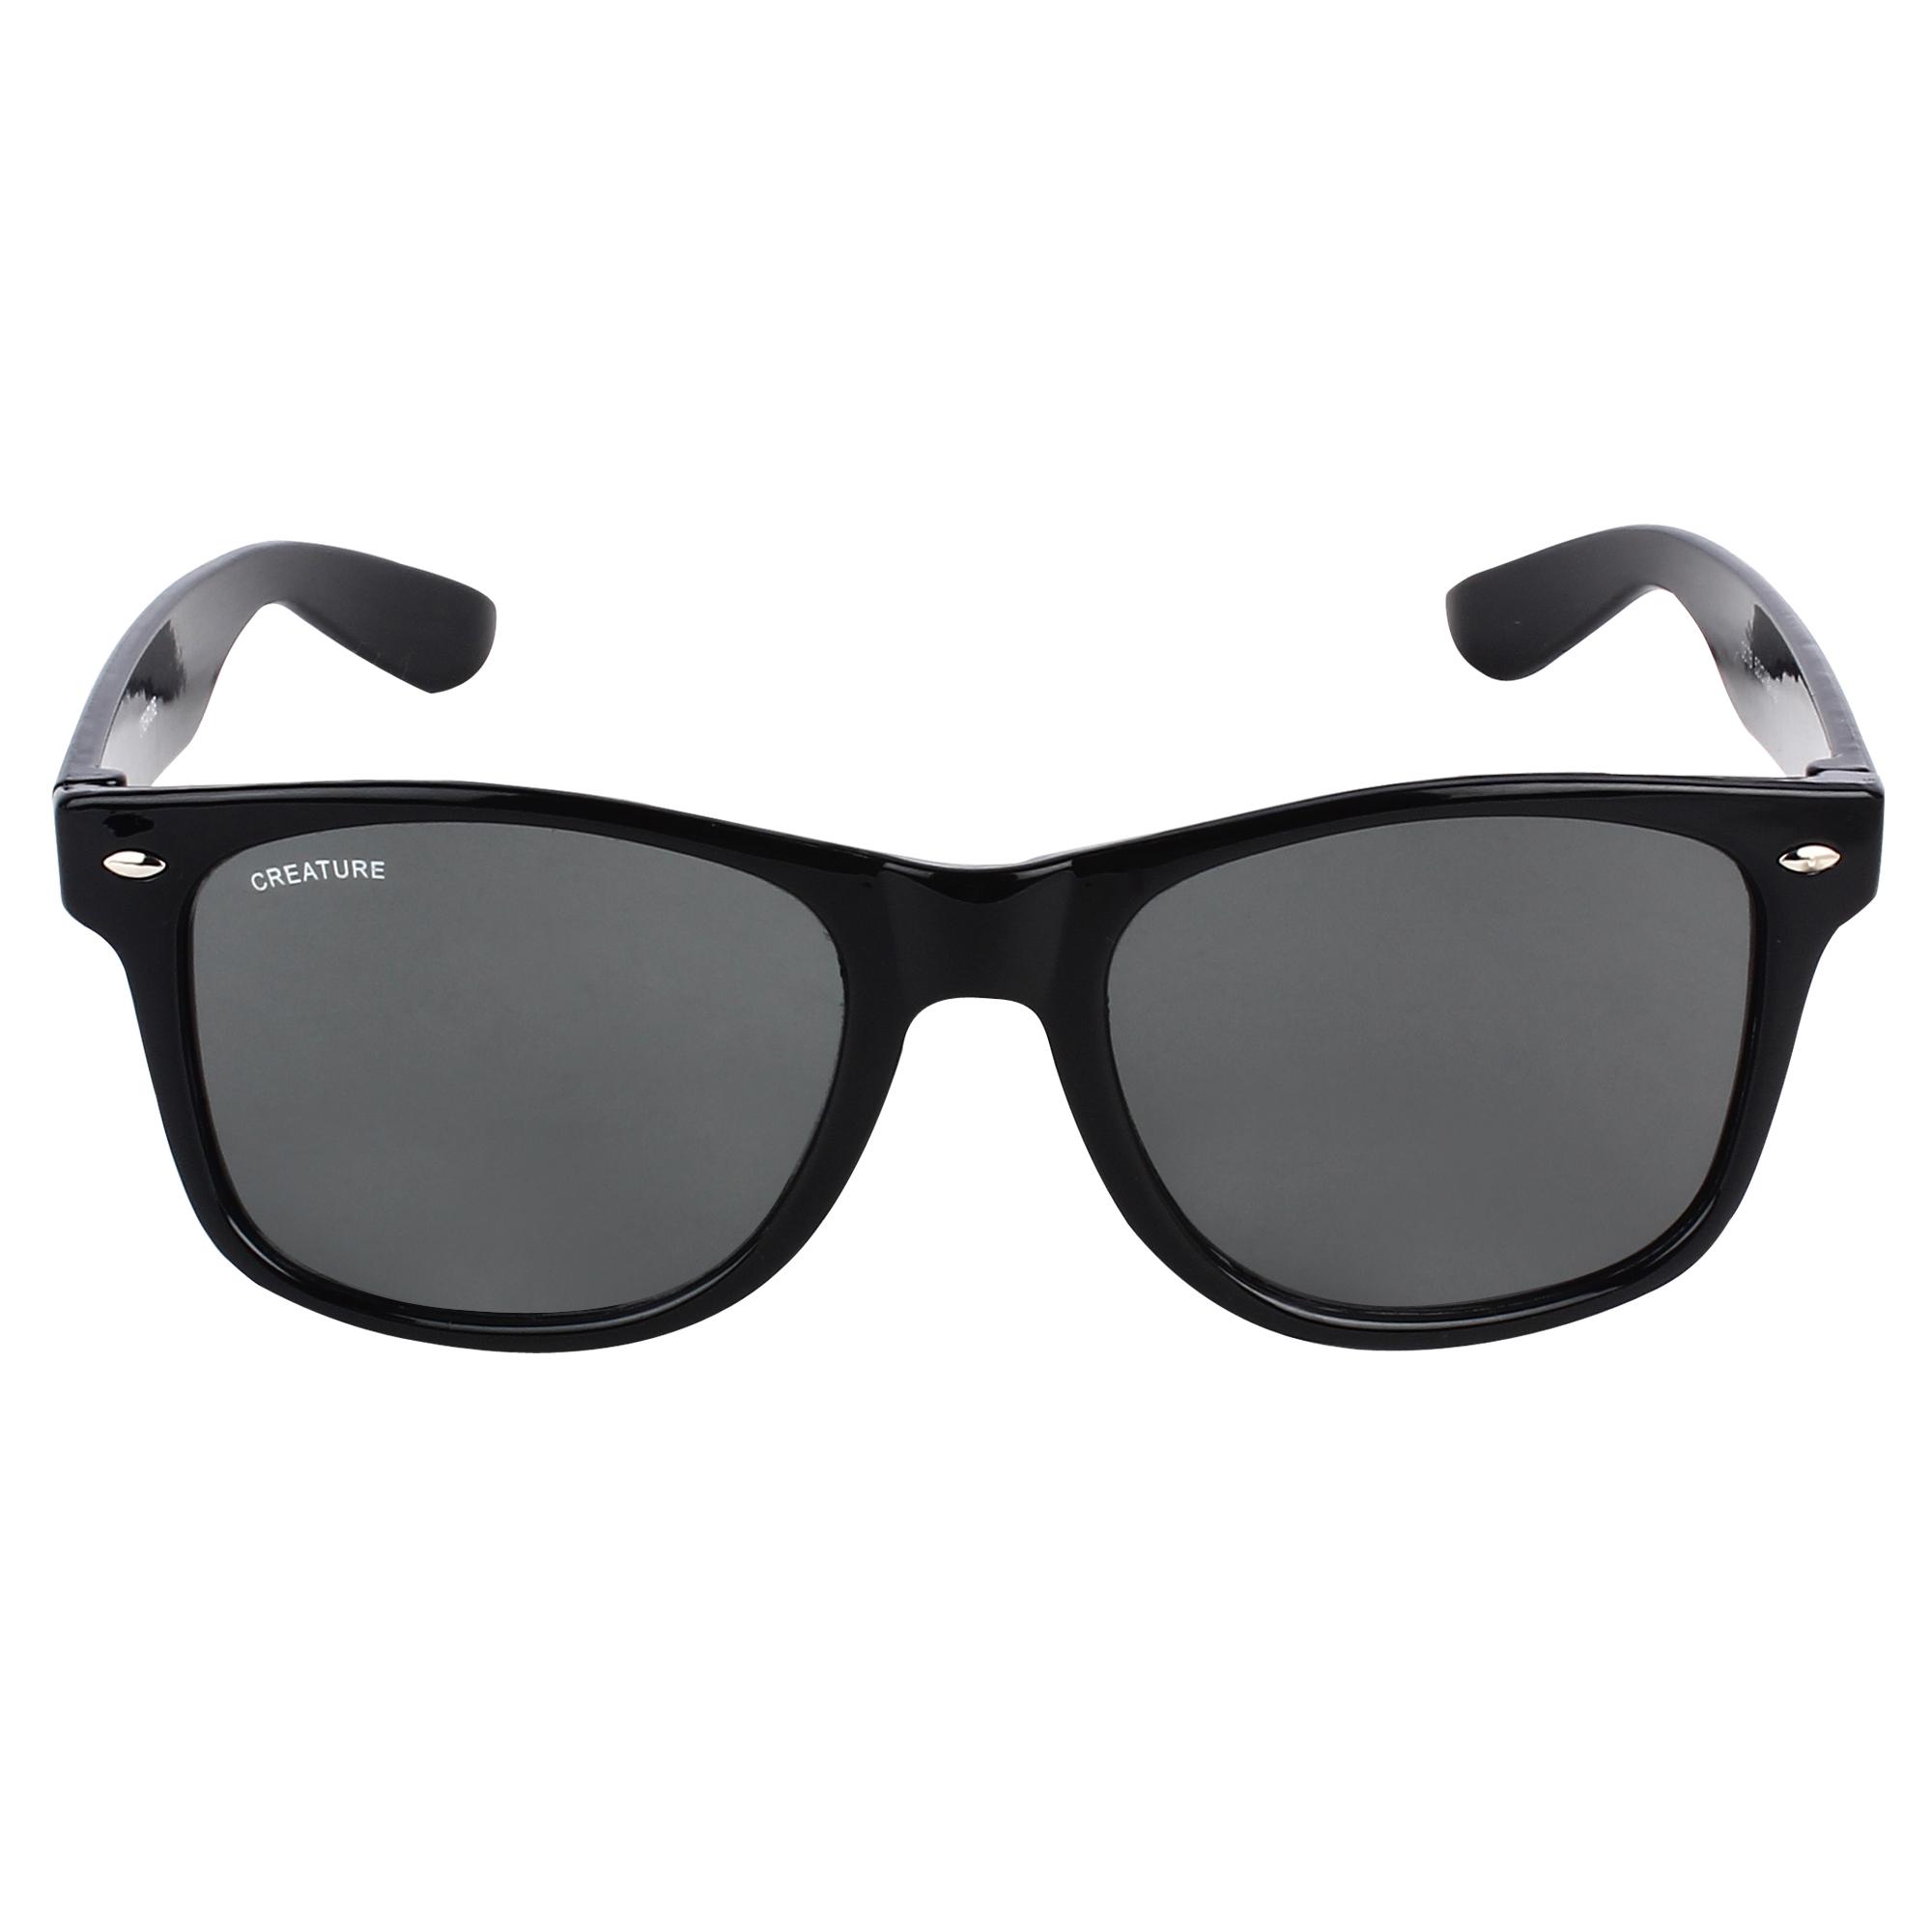 CREATURE   CREATURE Black Glossy Finish Unisex Wayfarer Sunglasses (Lens-Black Frame-Black)